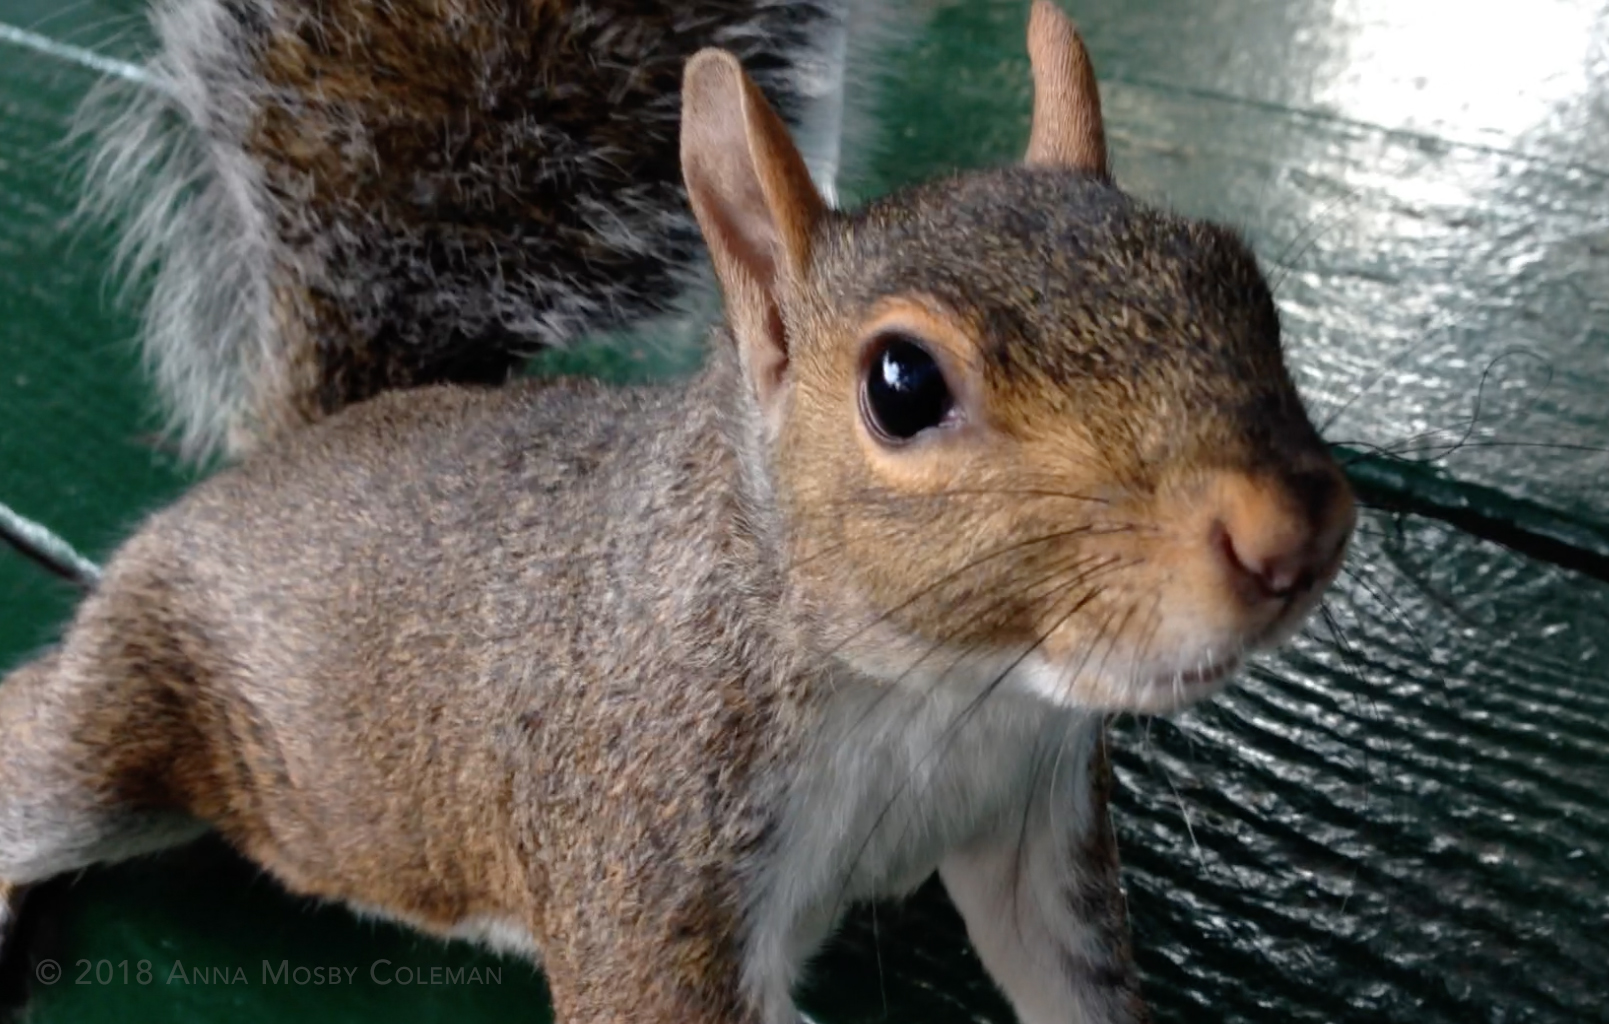 Groundhog_Day_Squirrel-Disputes-Weather-Prediction.jpg